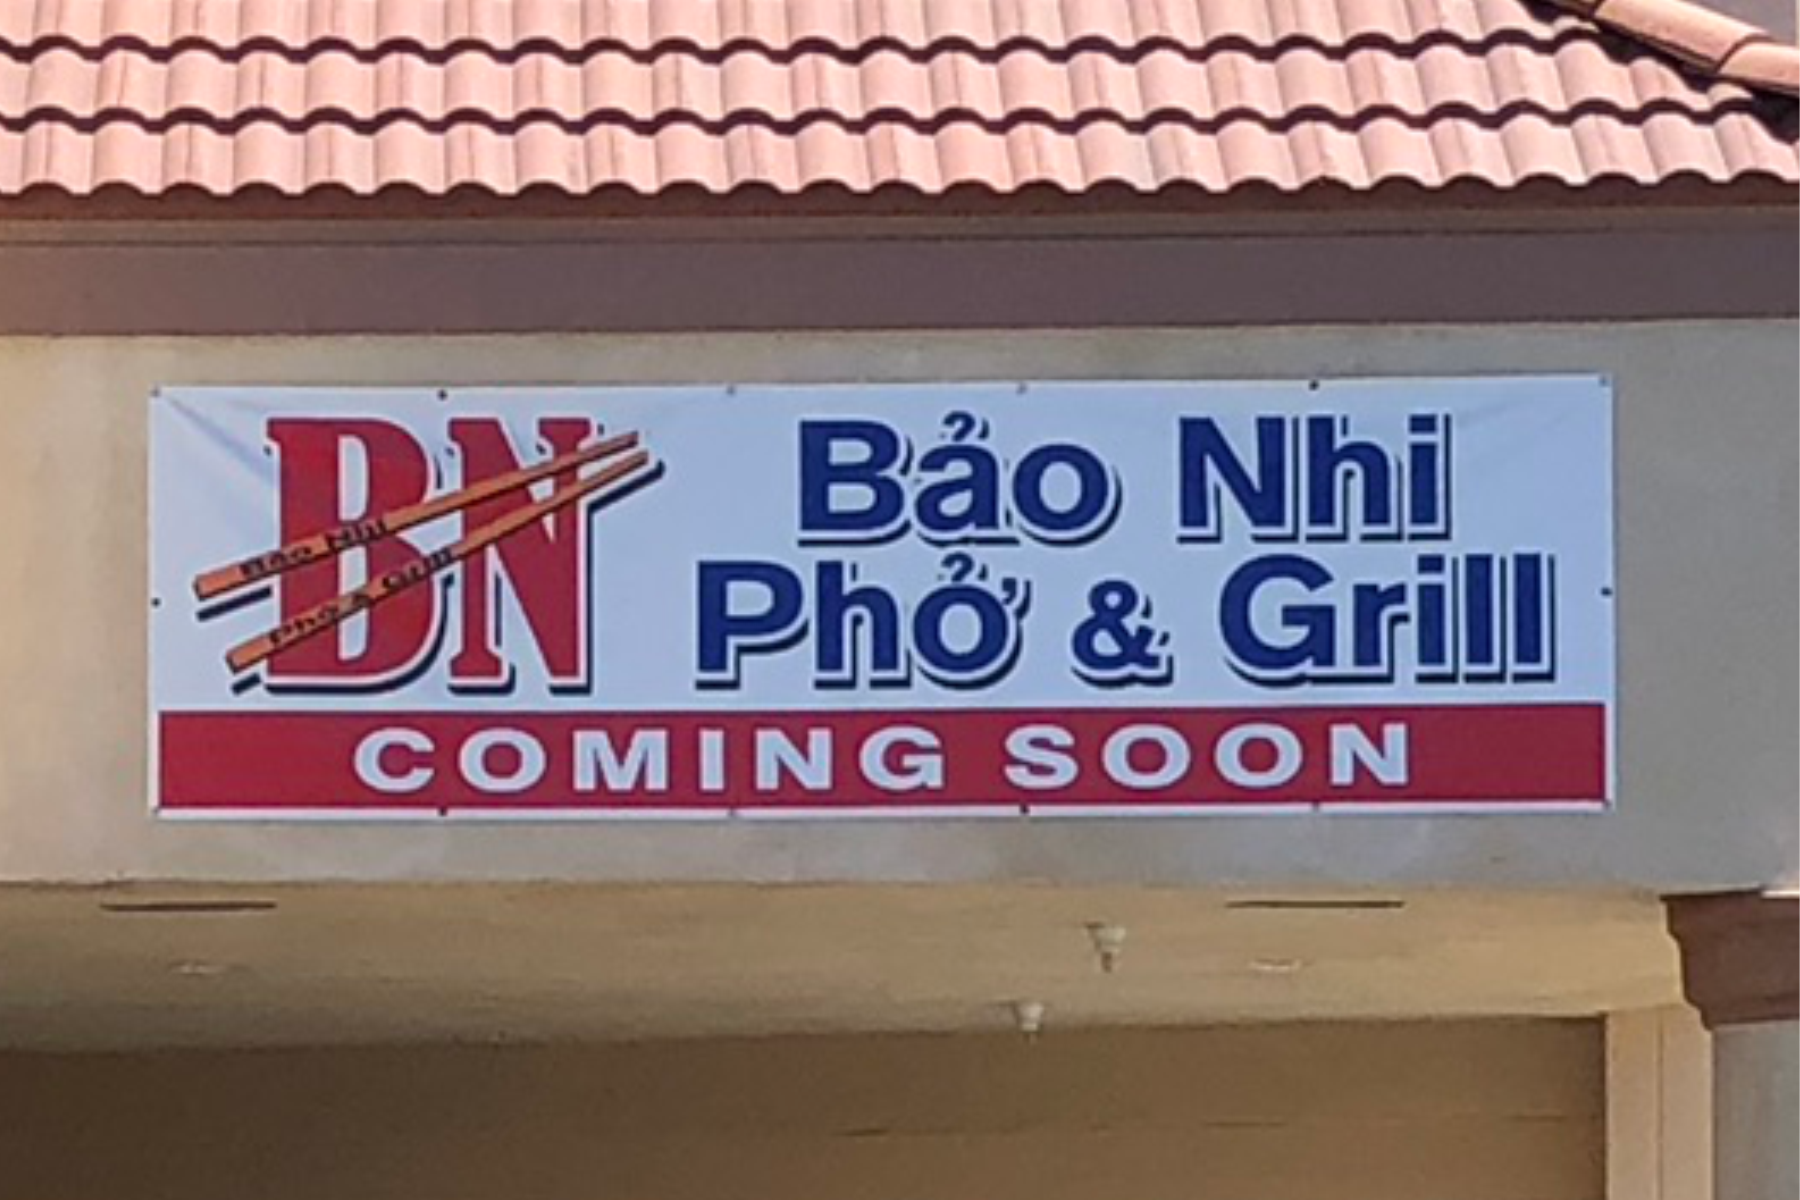 Bao Nhi Pho & Grill